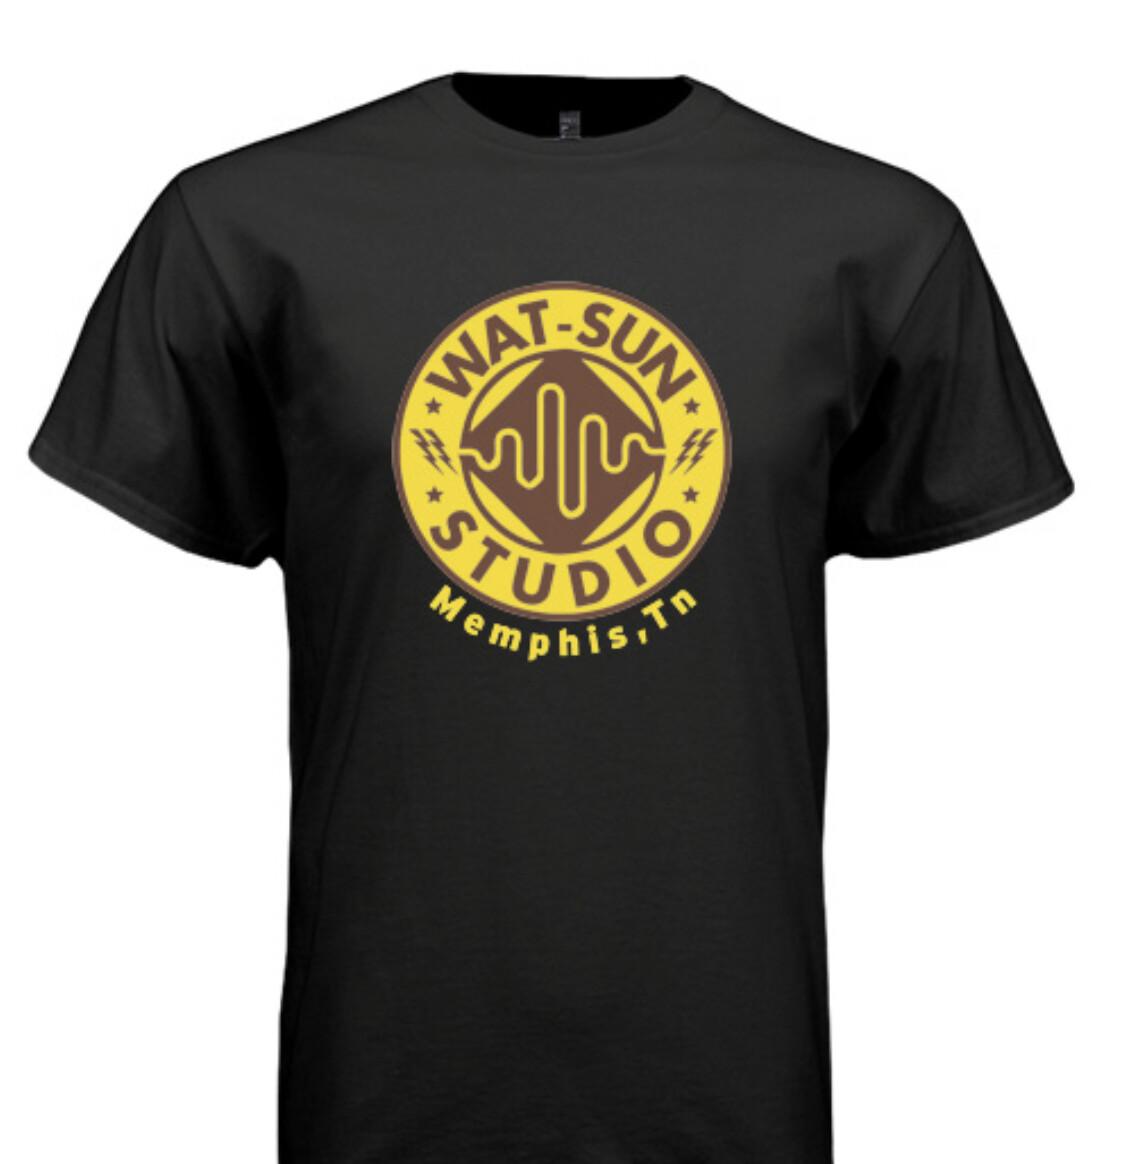 Wat-Sun T-Shirt